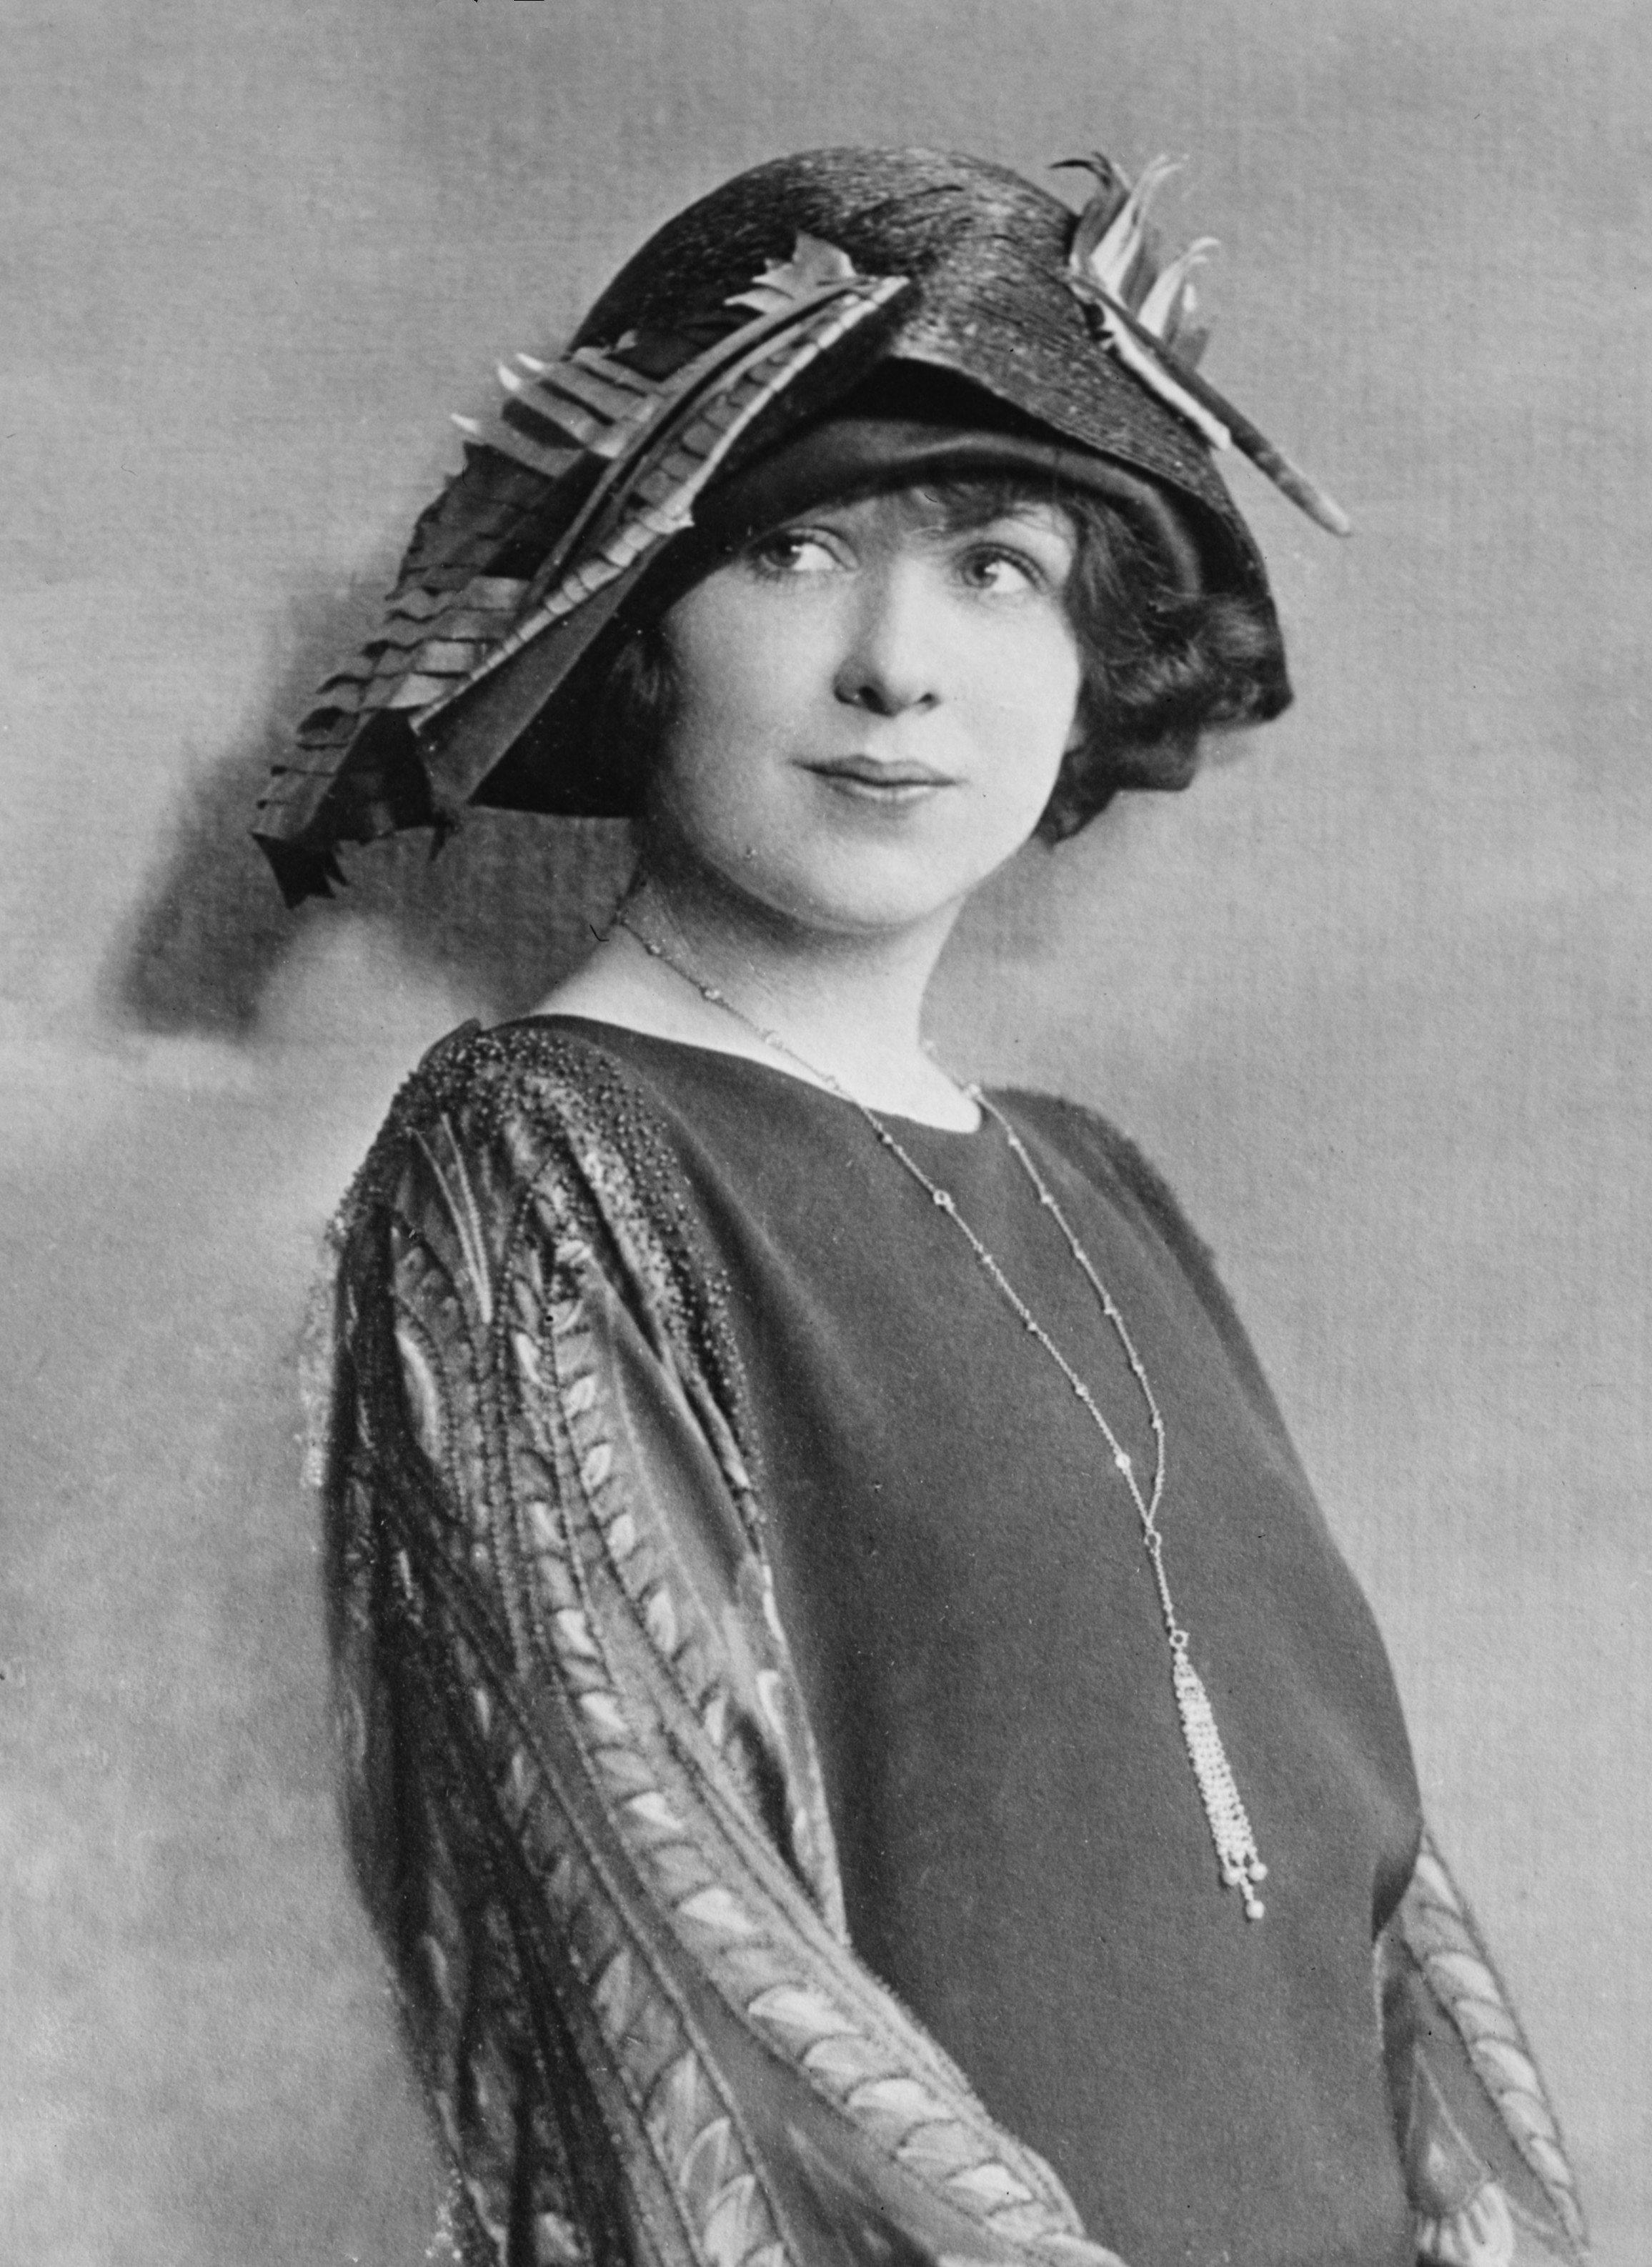 Edna Lawrence